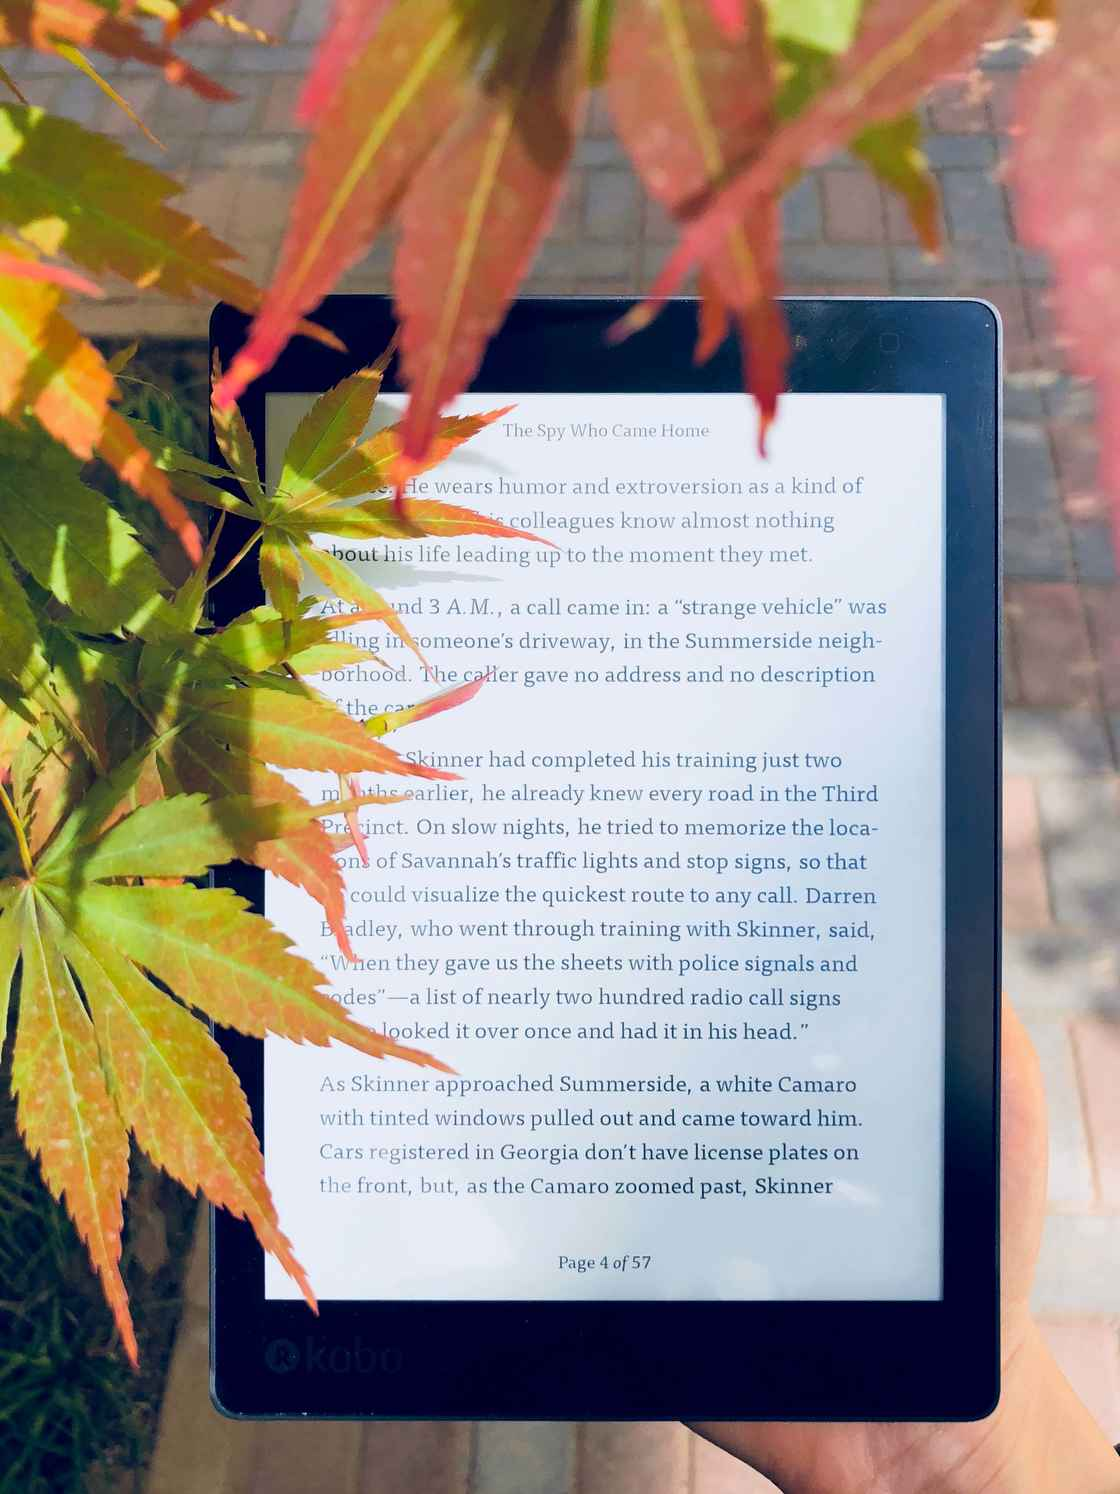 Aura ONE 阅读 Pocket 文章时仍会使用自己的排版引擎